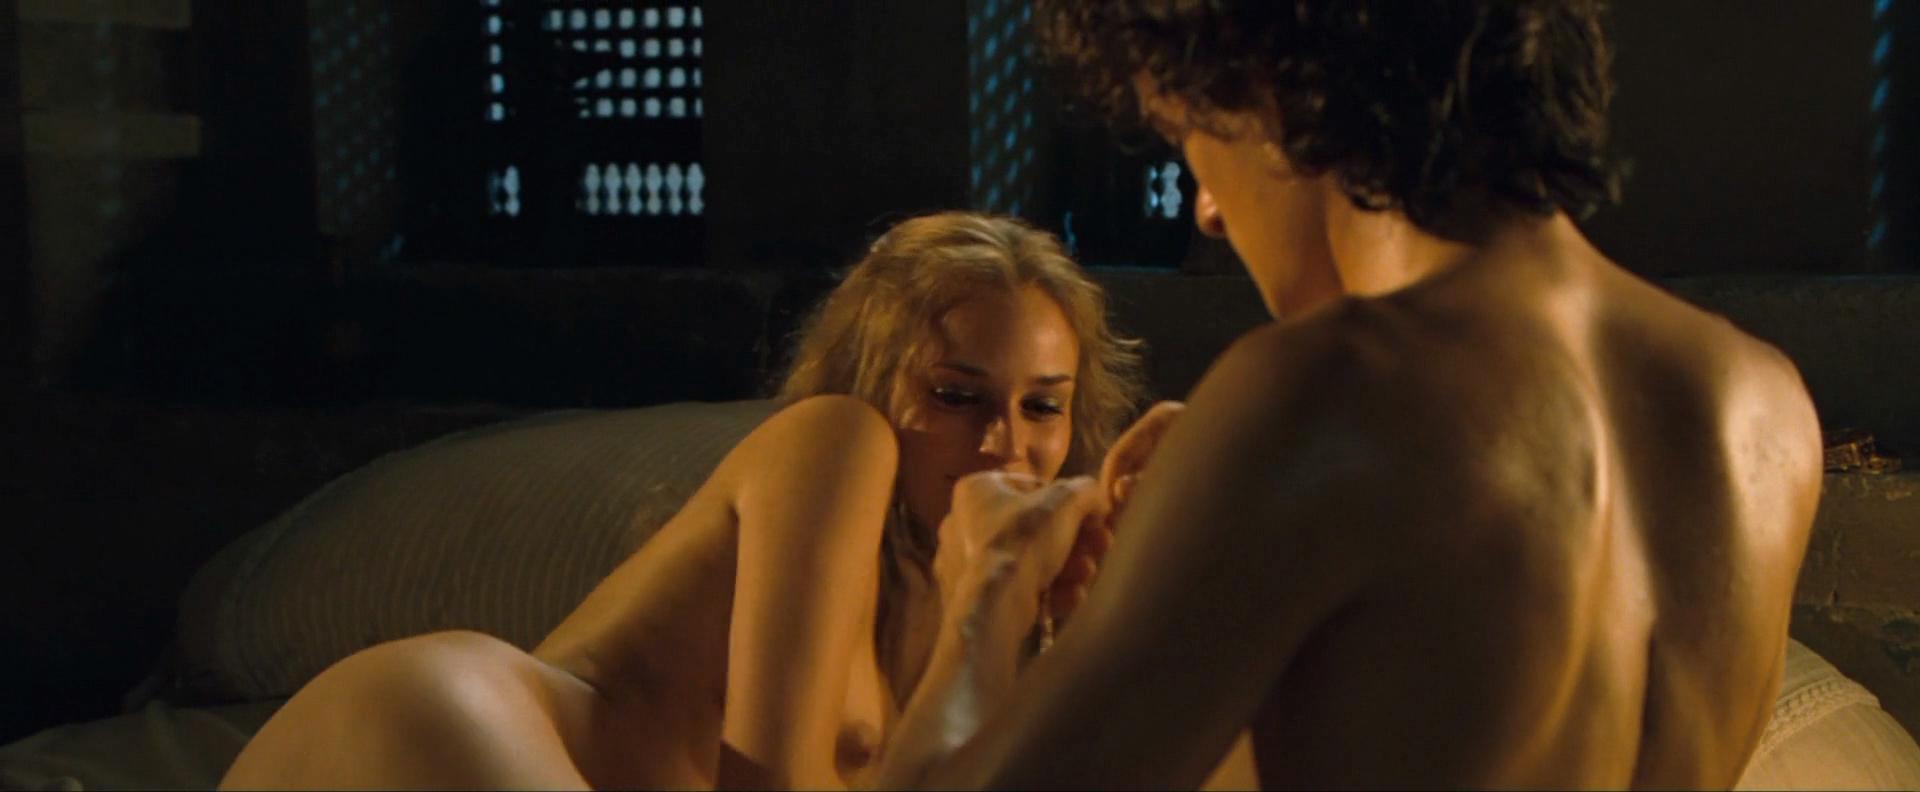 Diane Kruger culonas